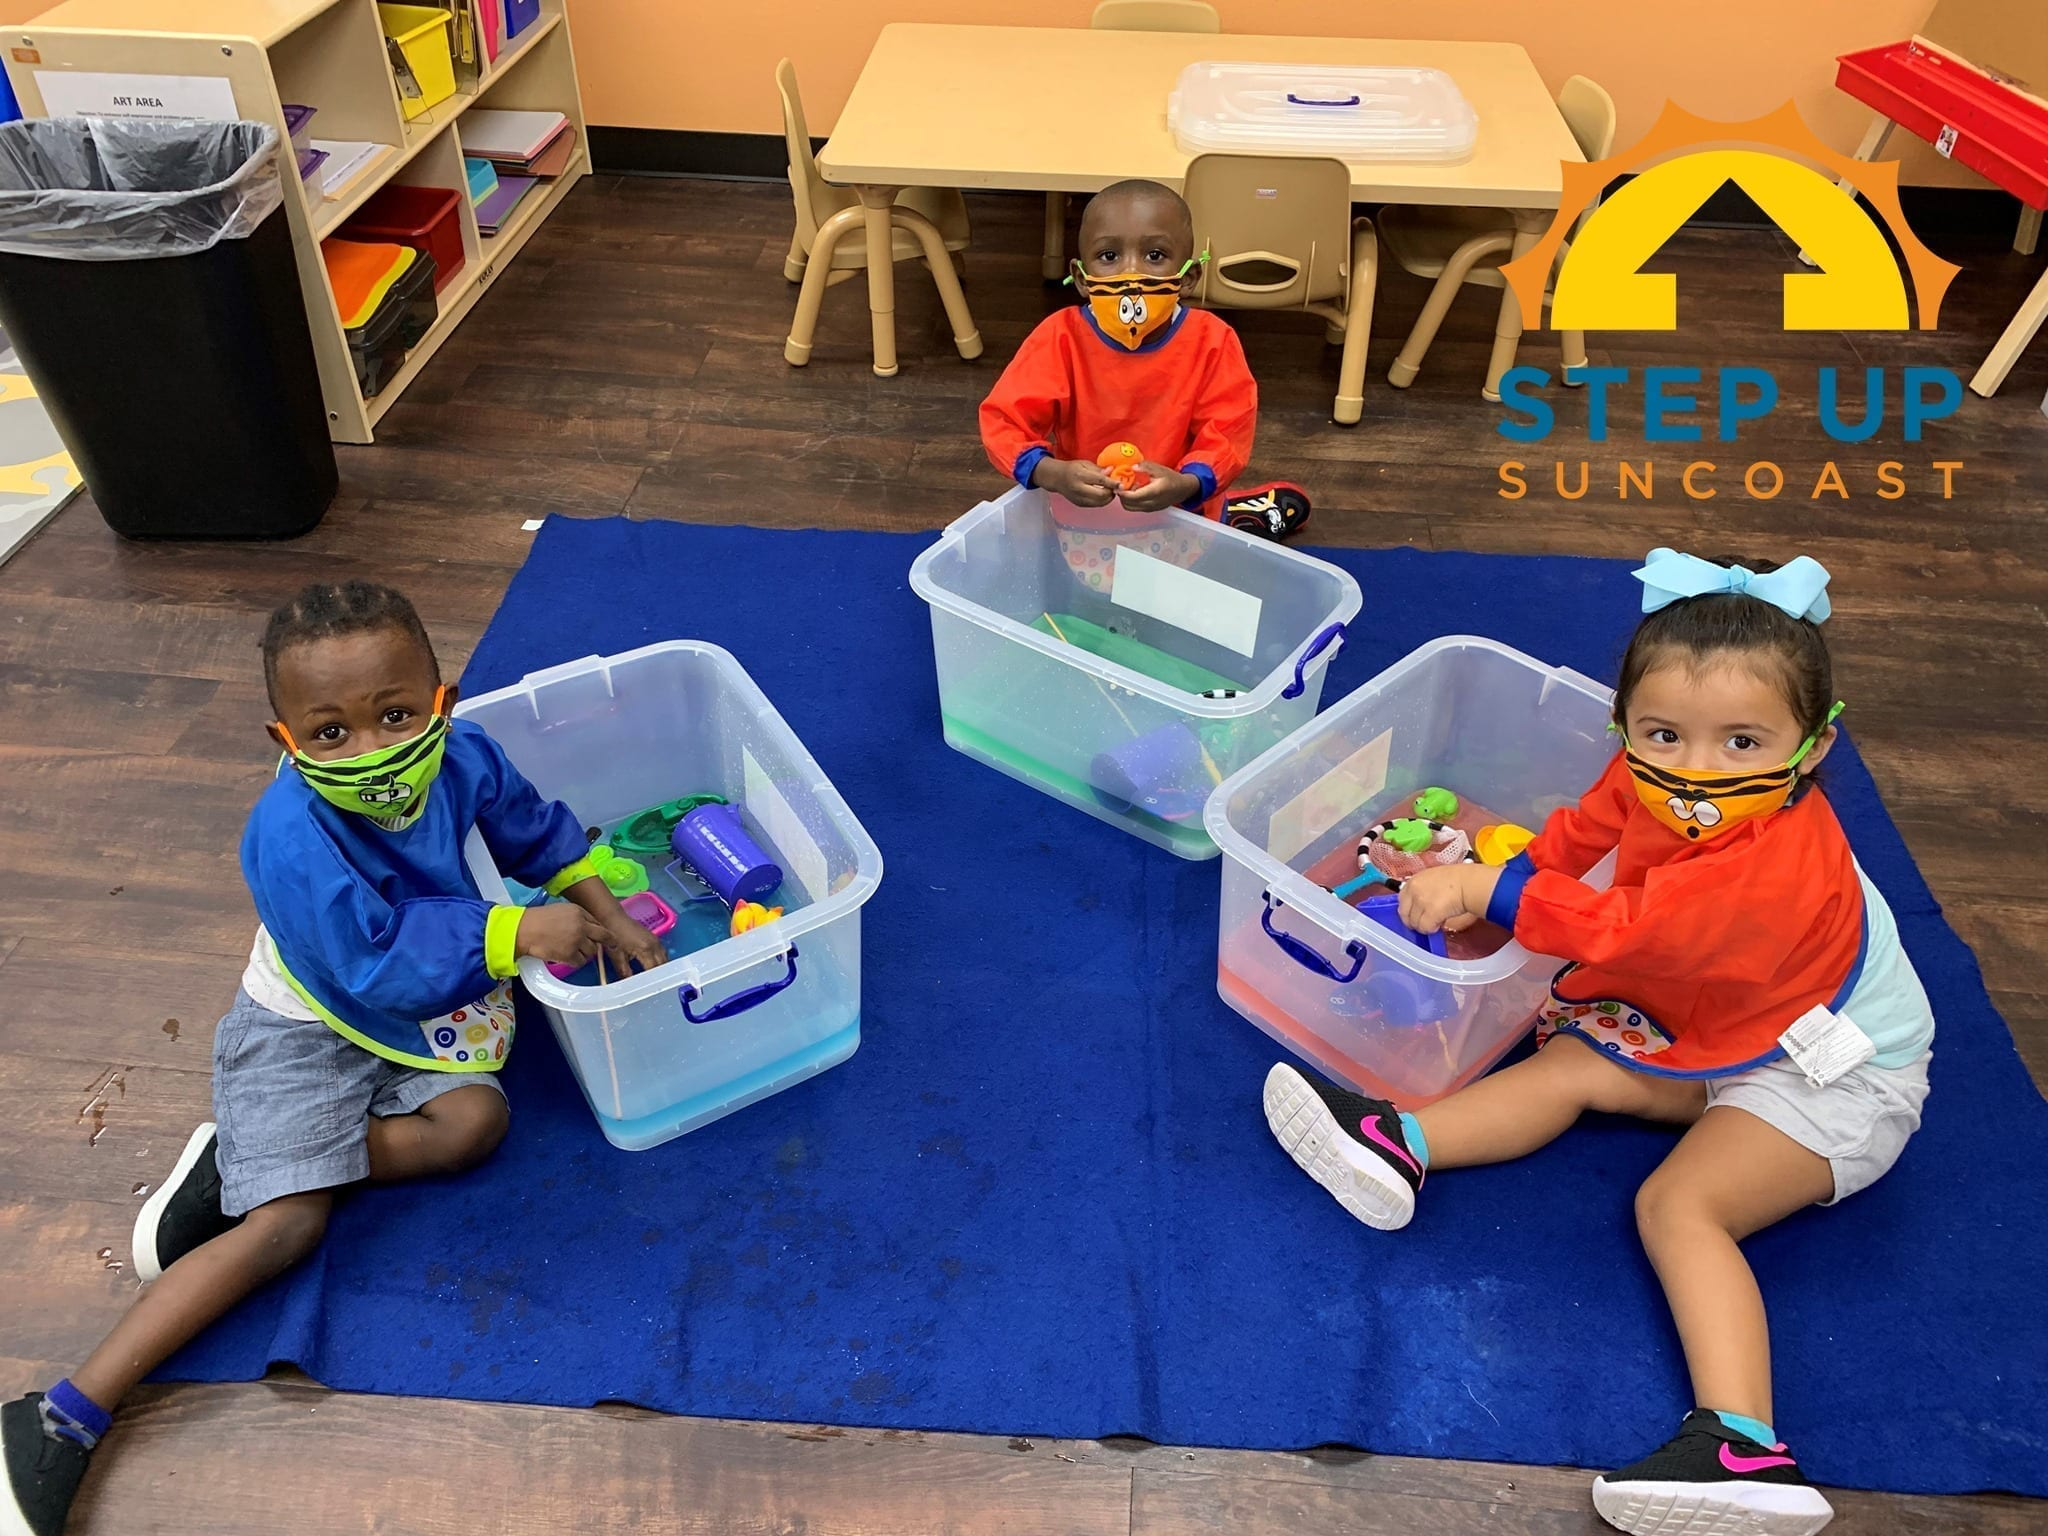 School Kids Step Up Suncoast Neal Land & Neighborhoods